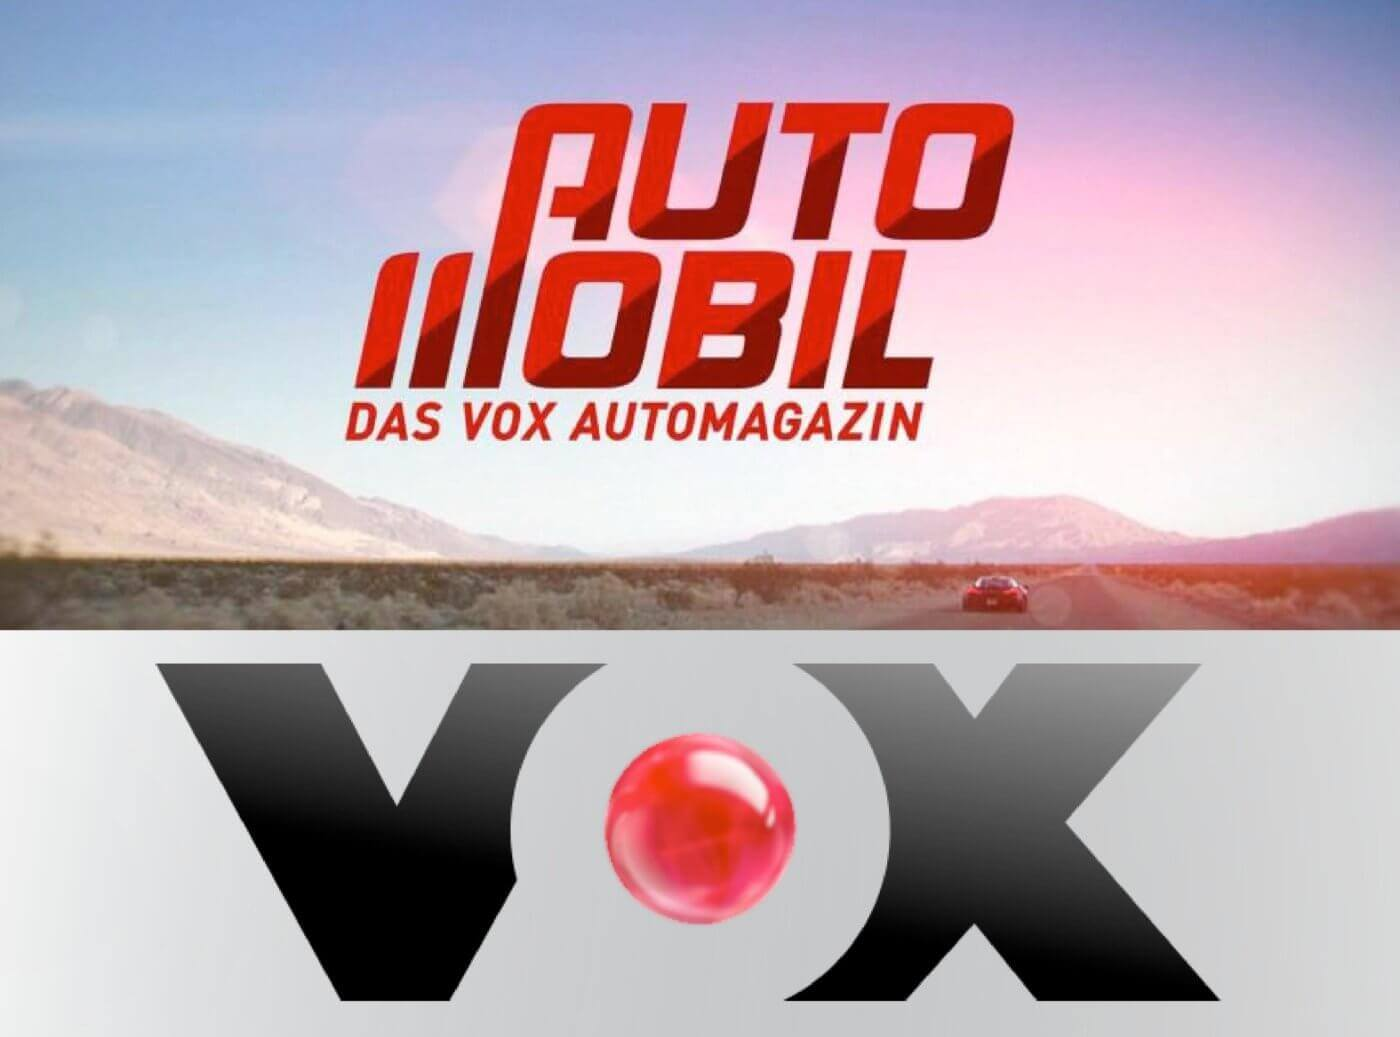 test gps tracker paj vox automobil - Testberichte - GPS Test